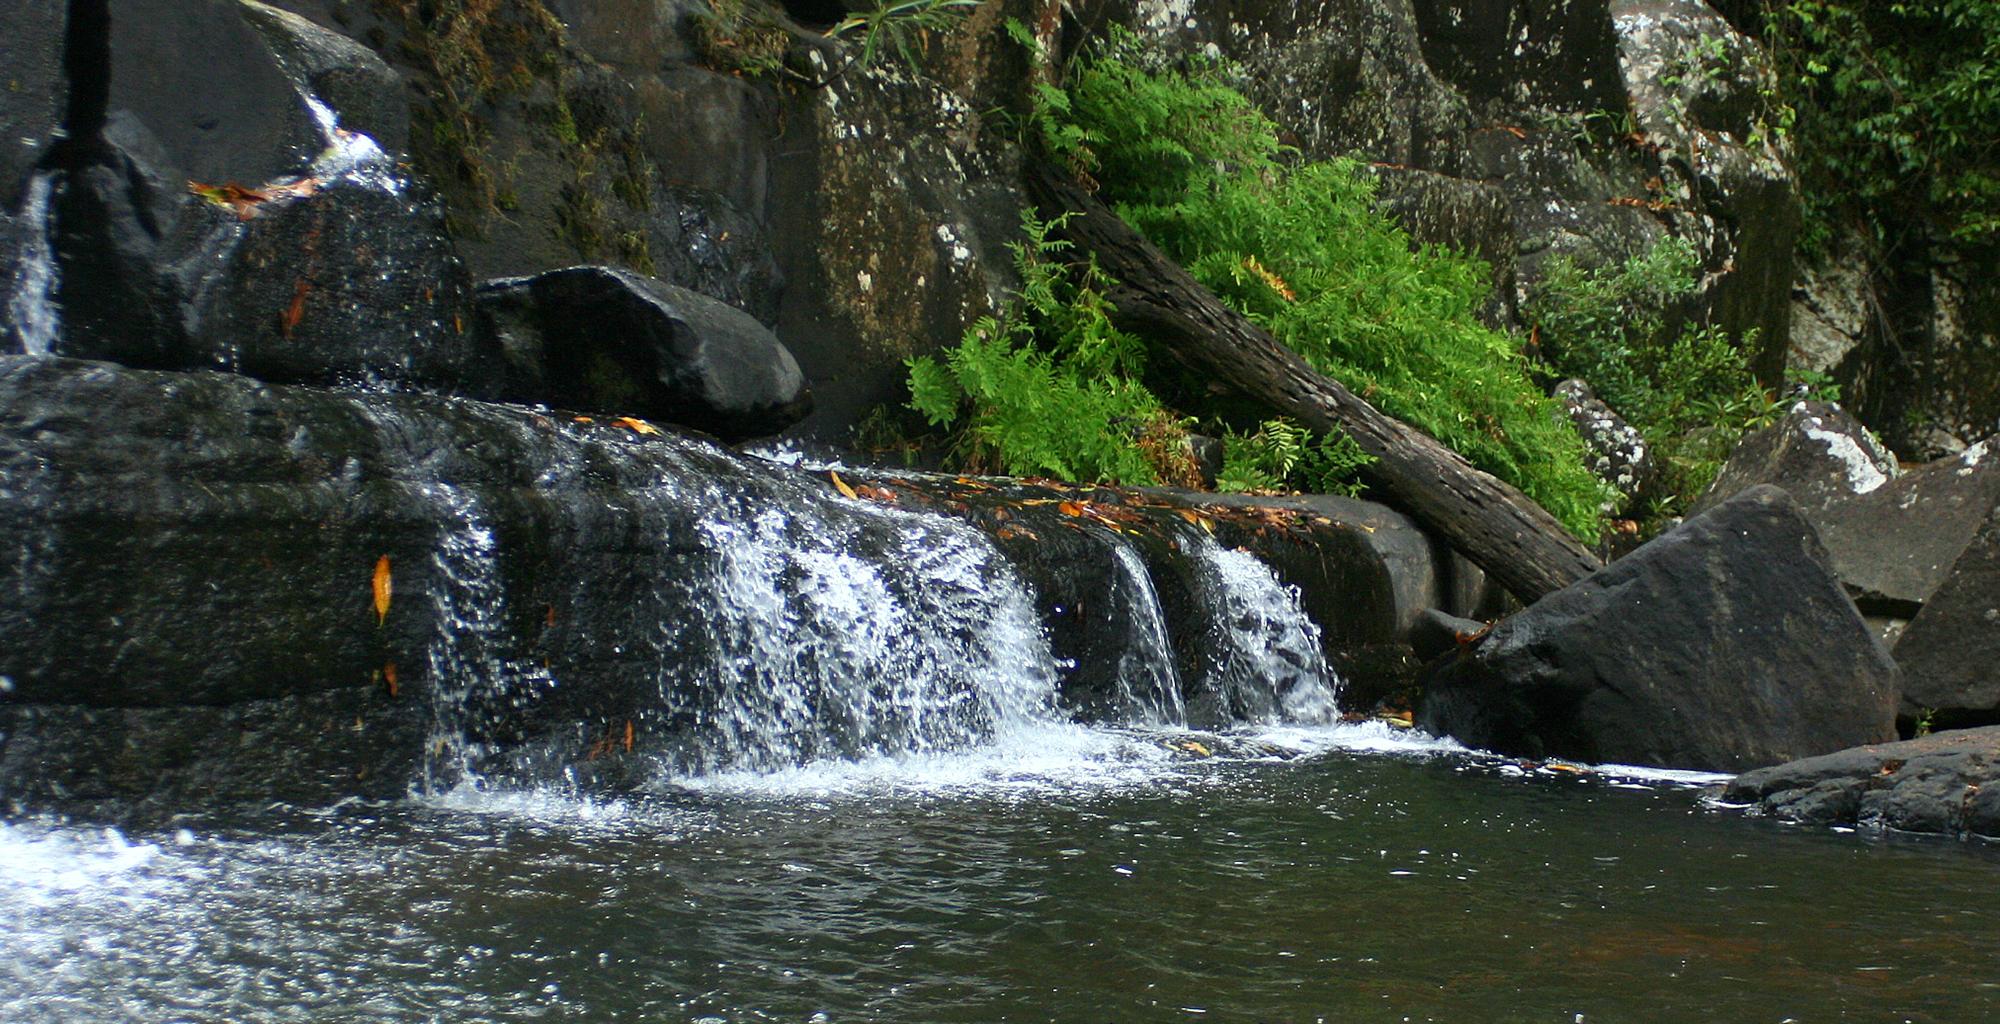 Mozambique-Gorongosa-National-Park-Explora-Gorongosa-Waterfall